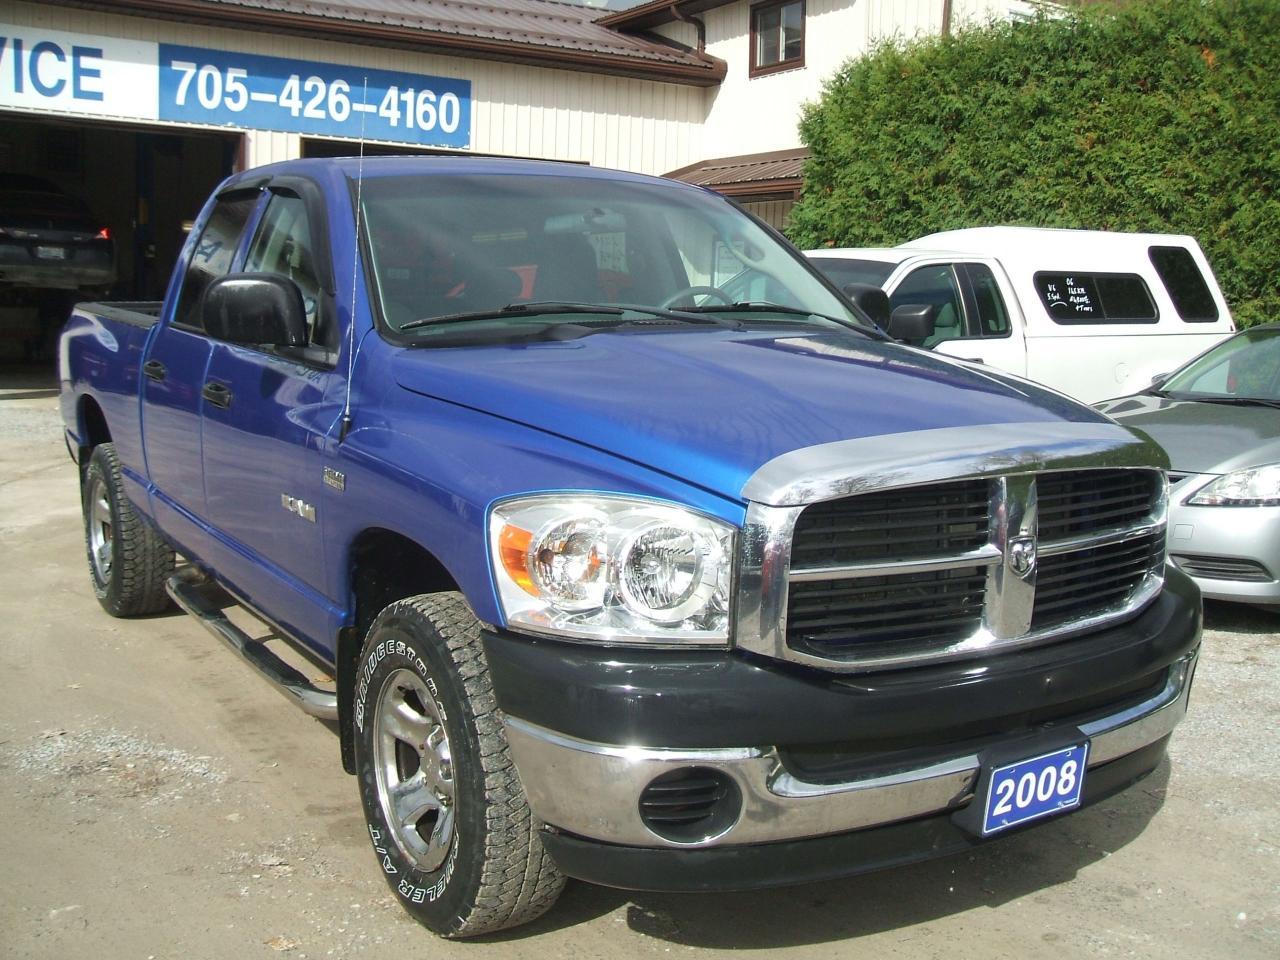 Photo of Blue 2008 Dodge Ram 1500